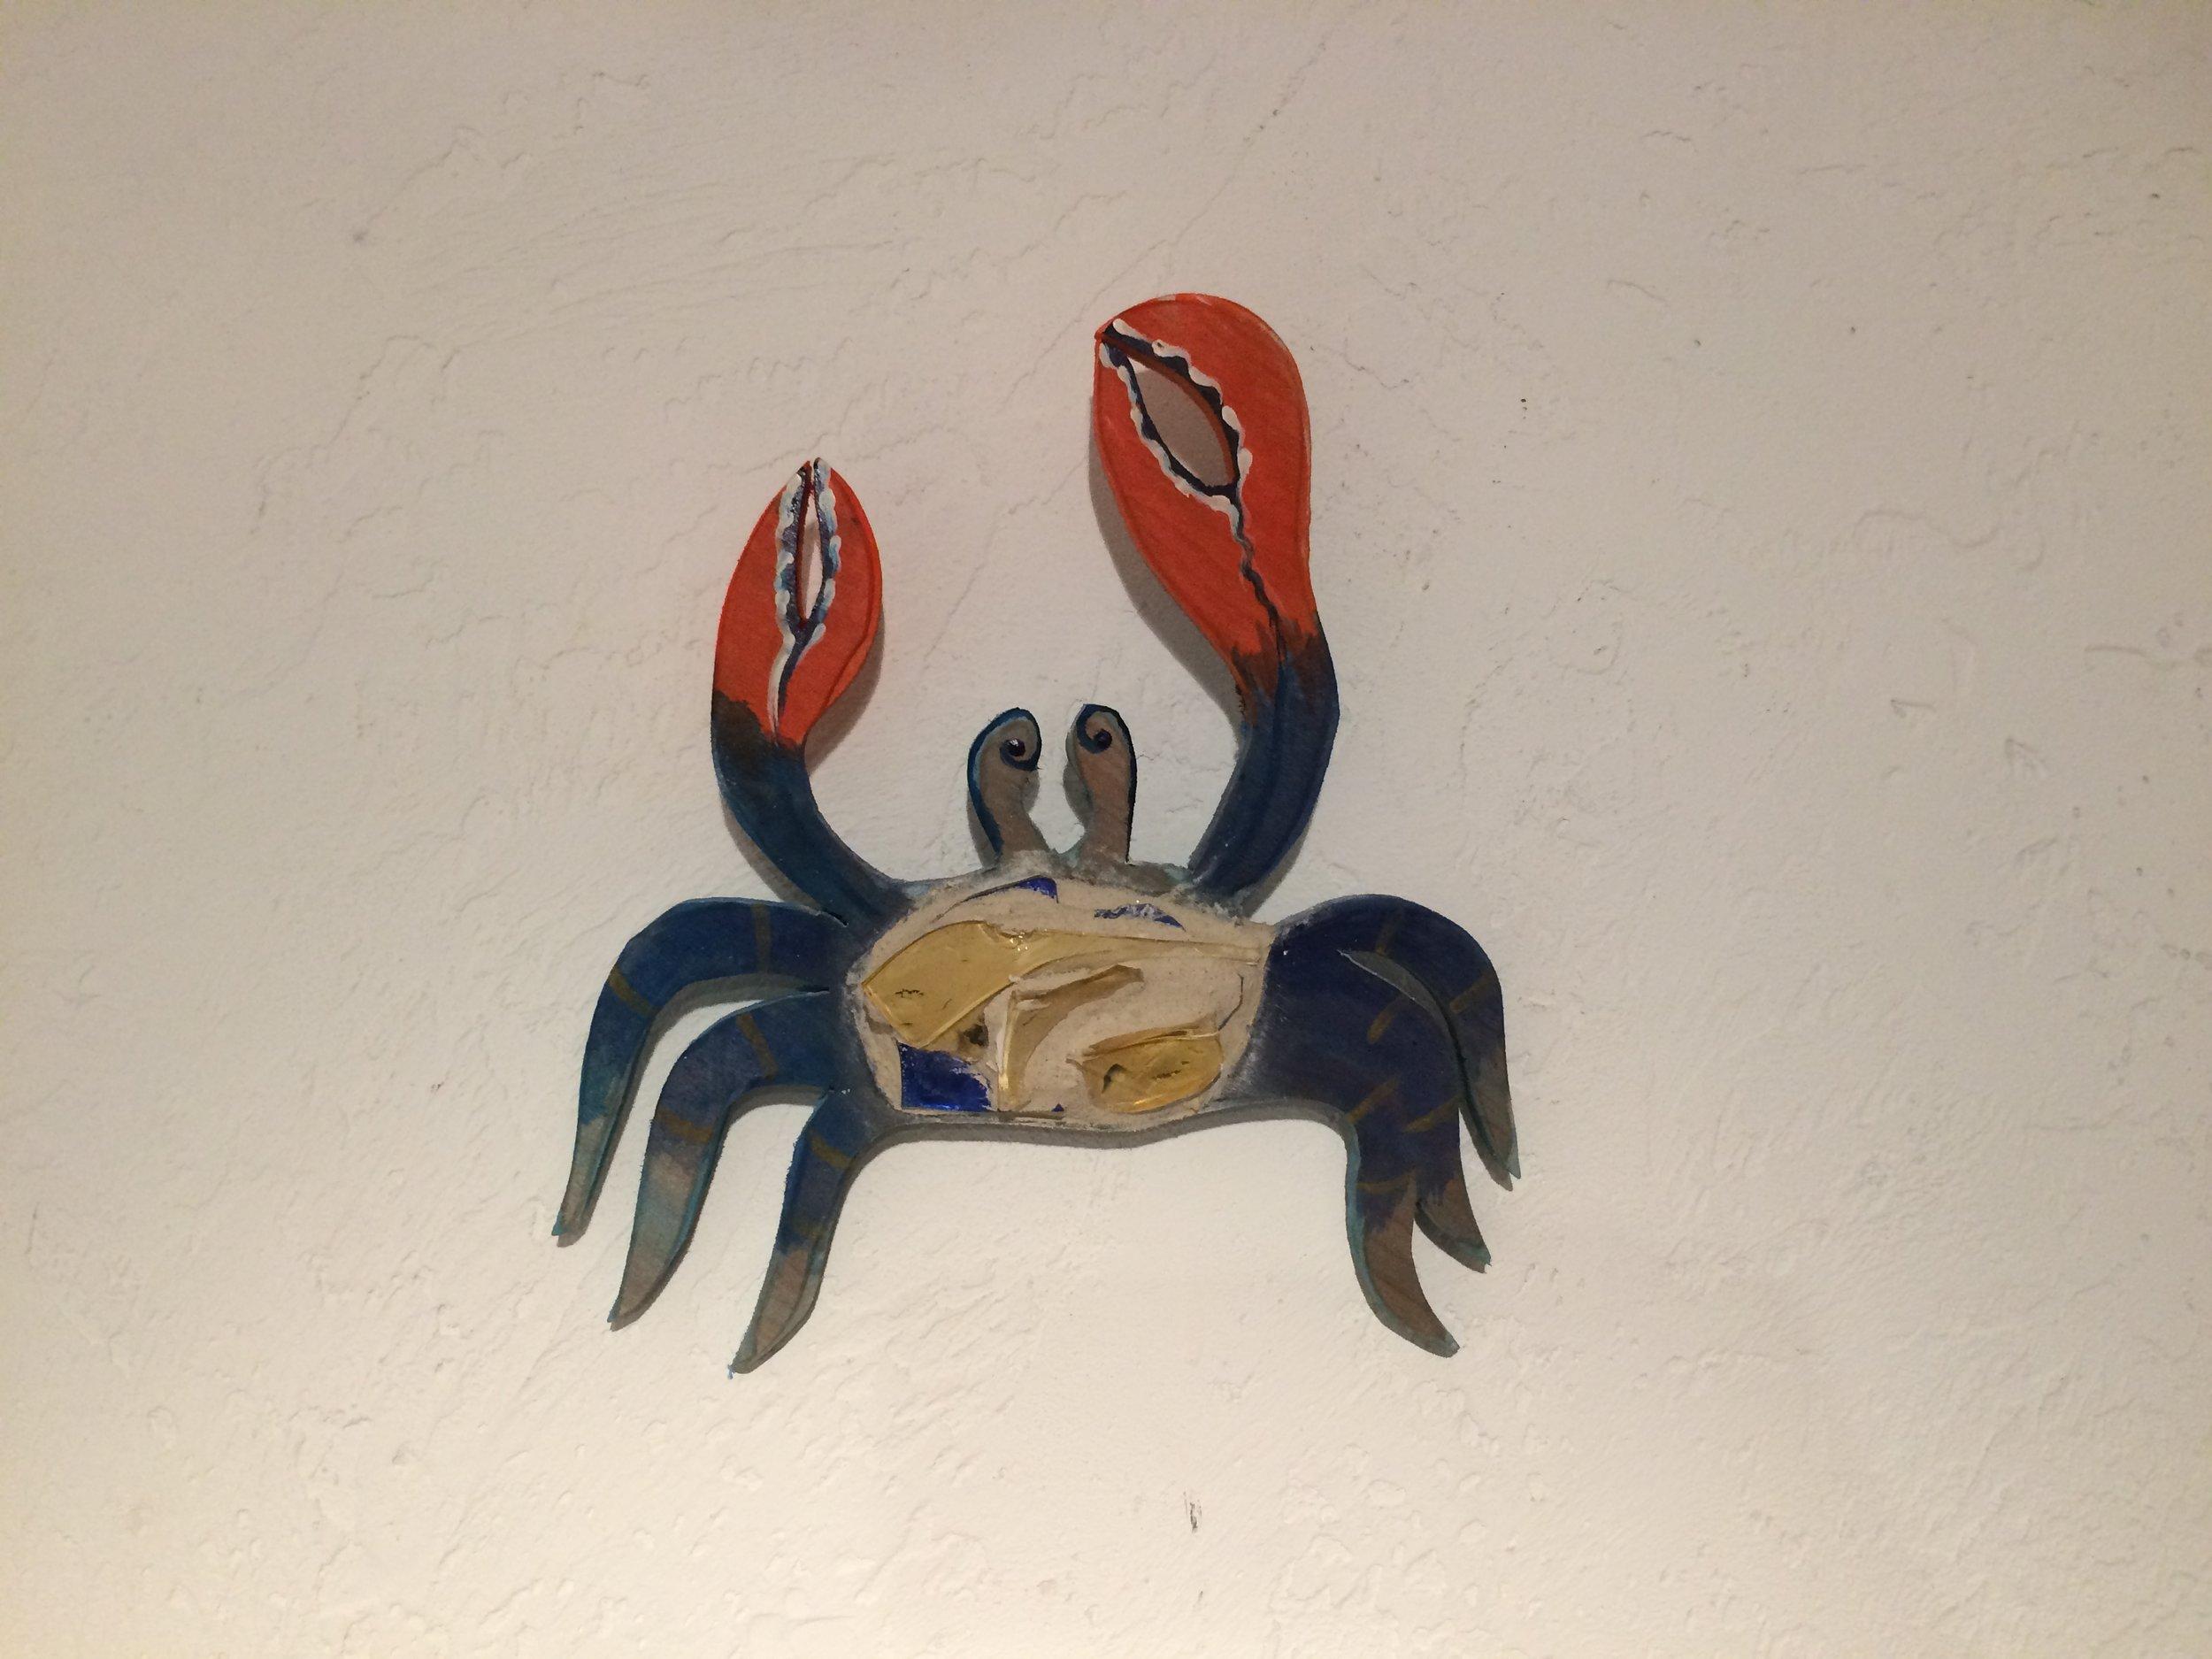 "Beach Art- Blue Crab, wood, glass mosaic sm. 9""x 10"" $36.00, lg 14"" x 14"" $55.00"